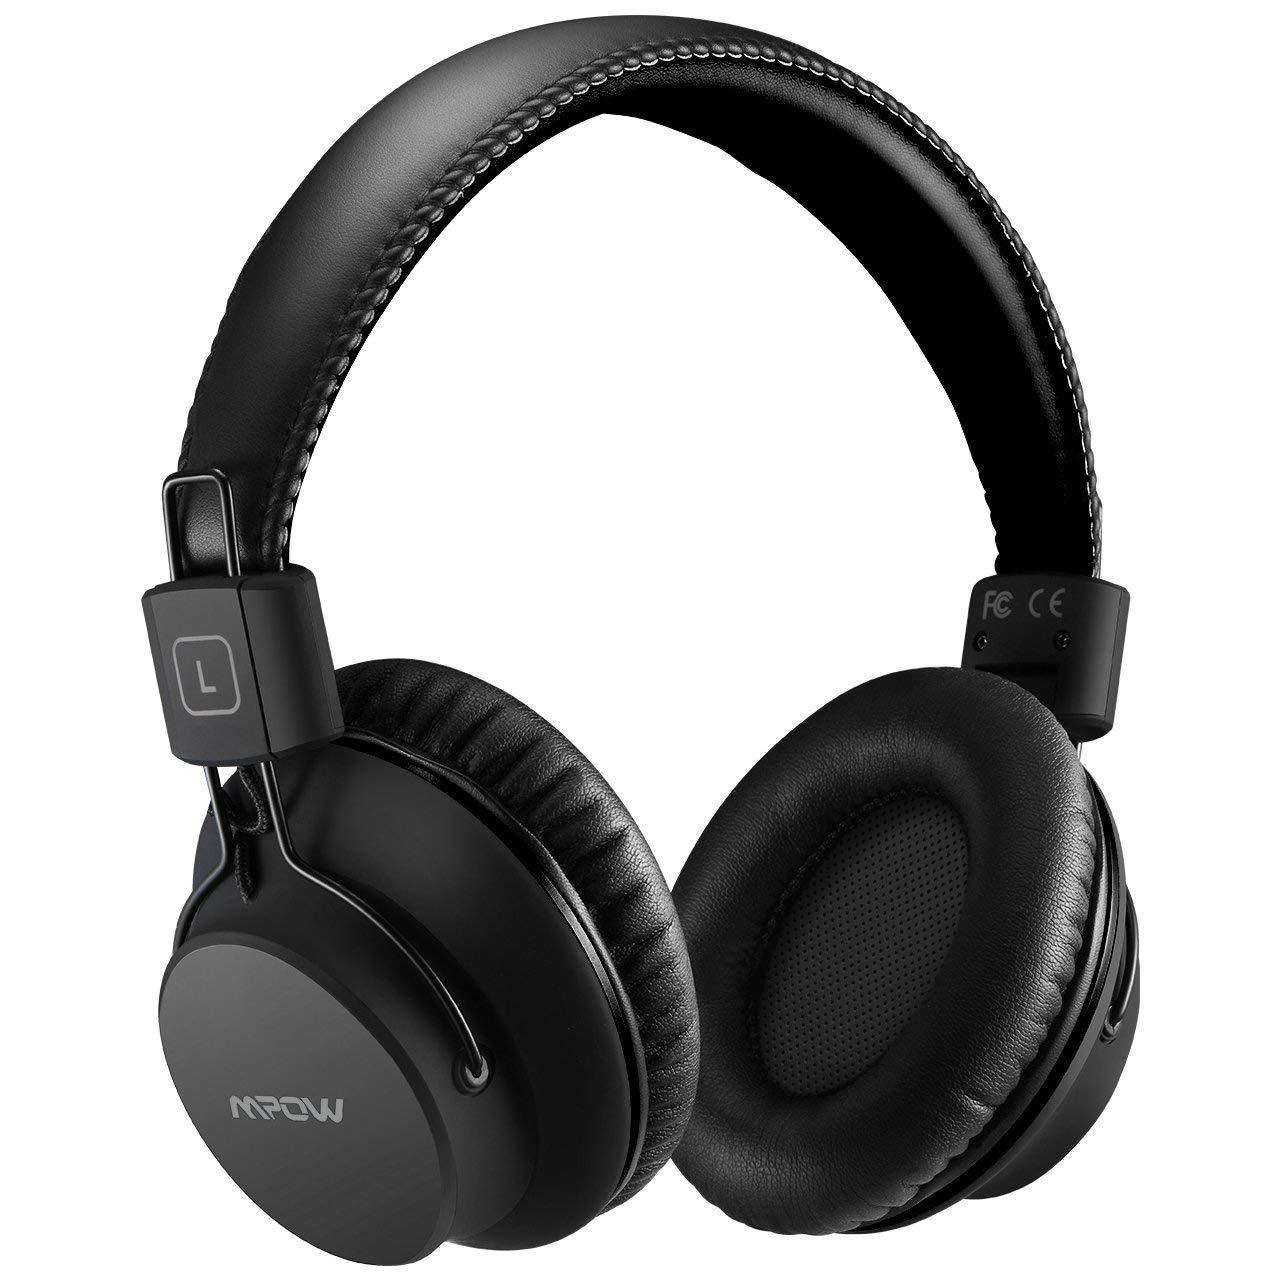 982a96e3285af7 Mpow H1 Cuffie Bluetooth, Cuffie Bluetooth CSR Over-Ear 4.1, Autonomia 20  Ore, Cuffie Bluetooth Pieghevole Ergonomico con Microfono, Riduzione di  Rumore, ...